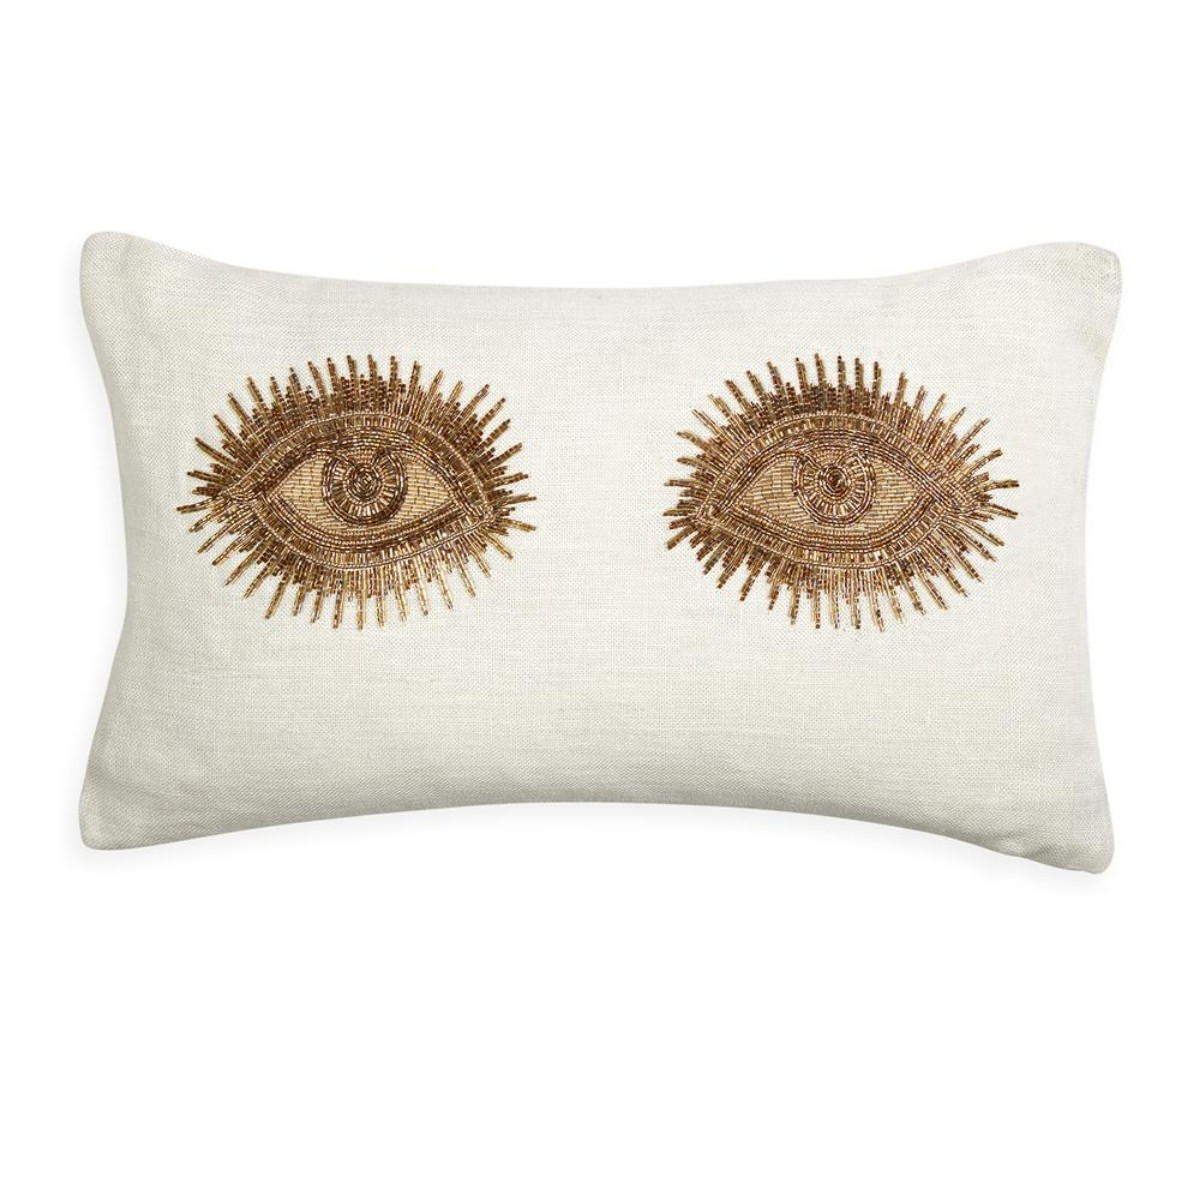 Jonathan Adler I Muse Eyes Throw Pillow